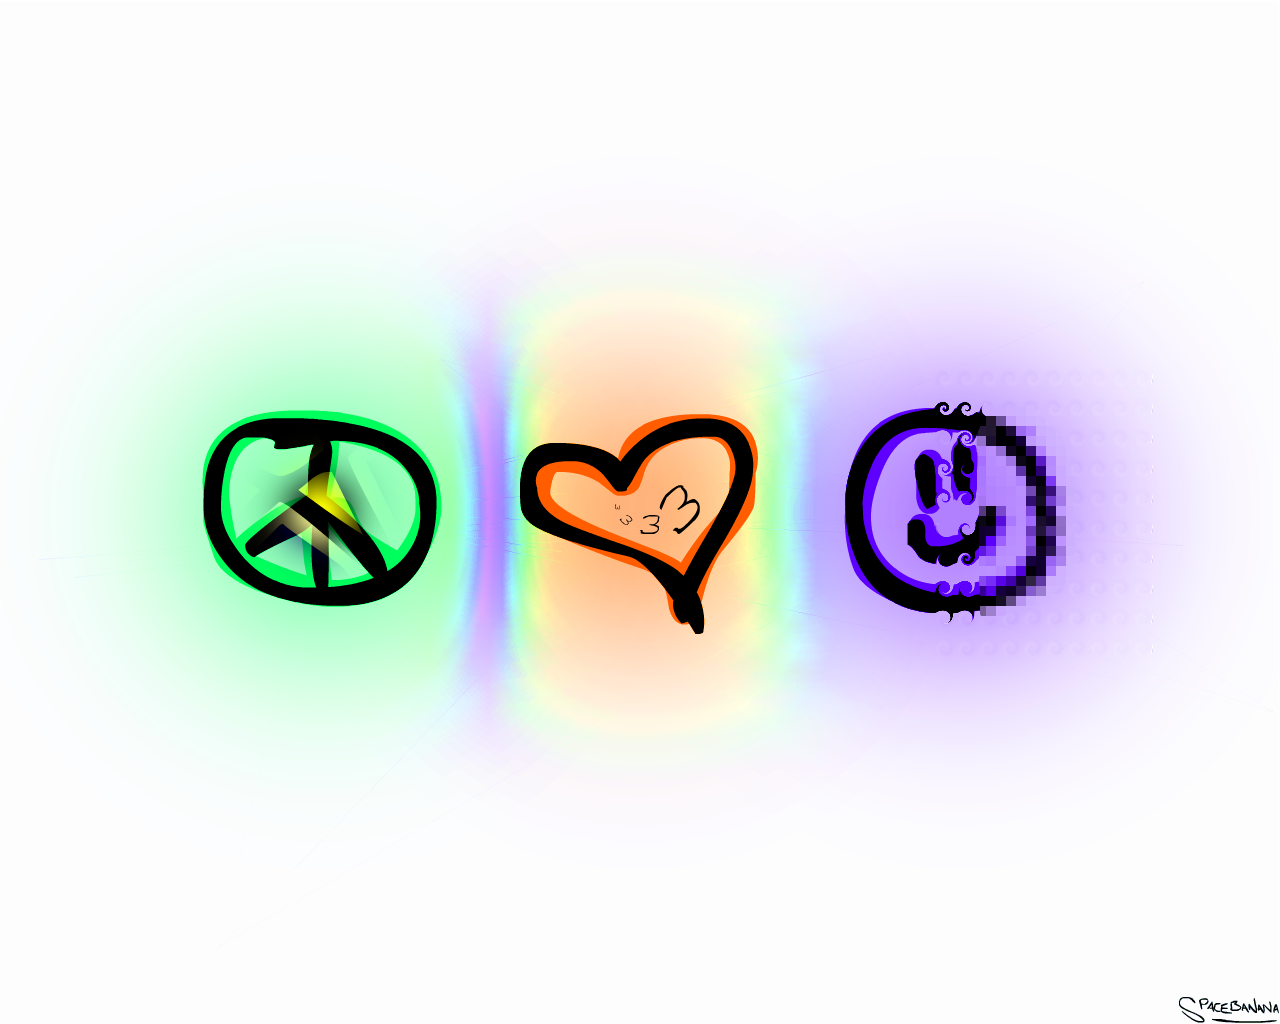 Peace love happiness acid by spacebanana on deviantart spacebanana peace love happiness acid by spacebanana biocorpaavc Choice Image